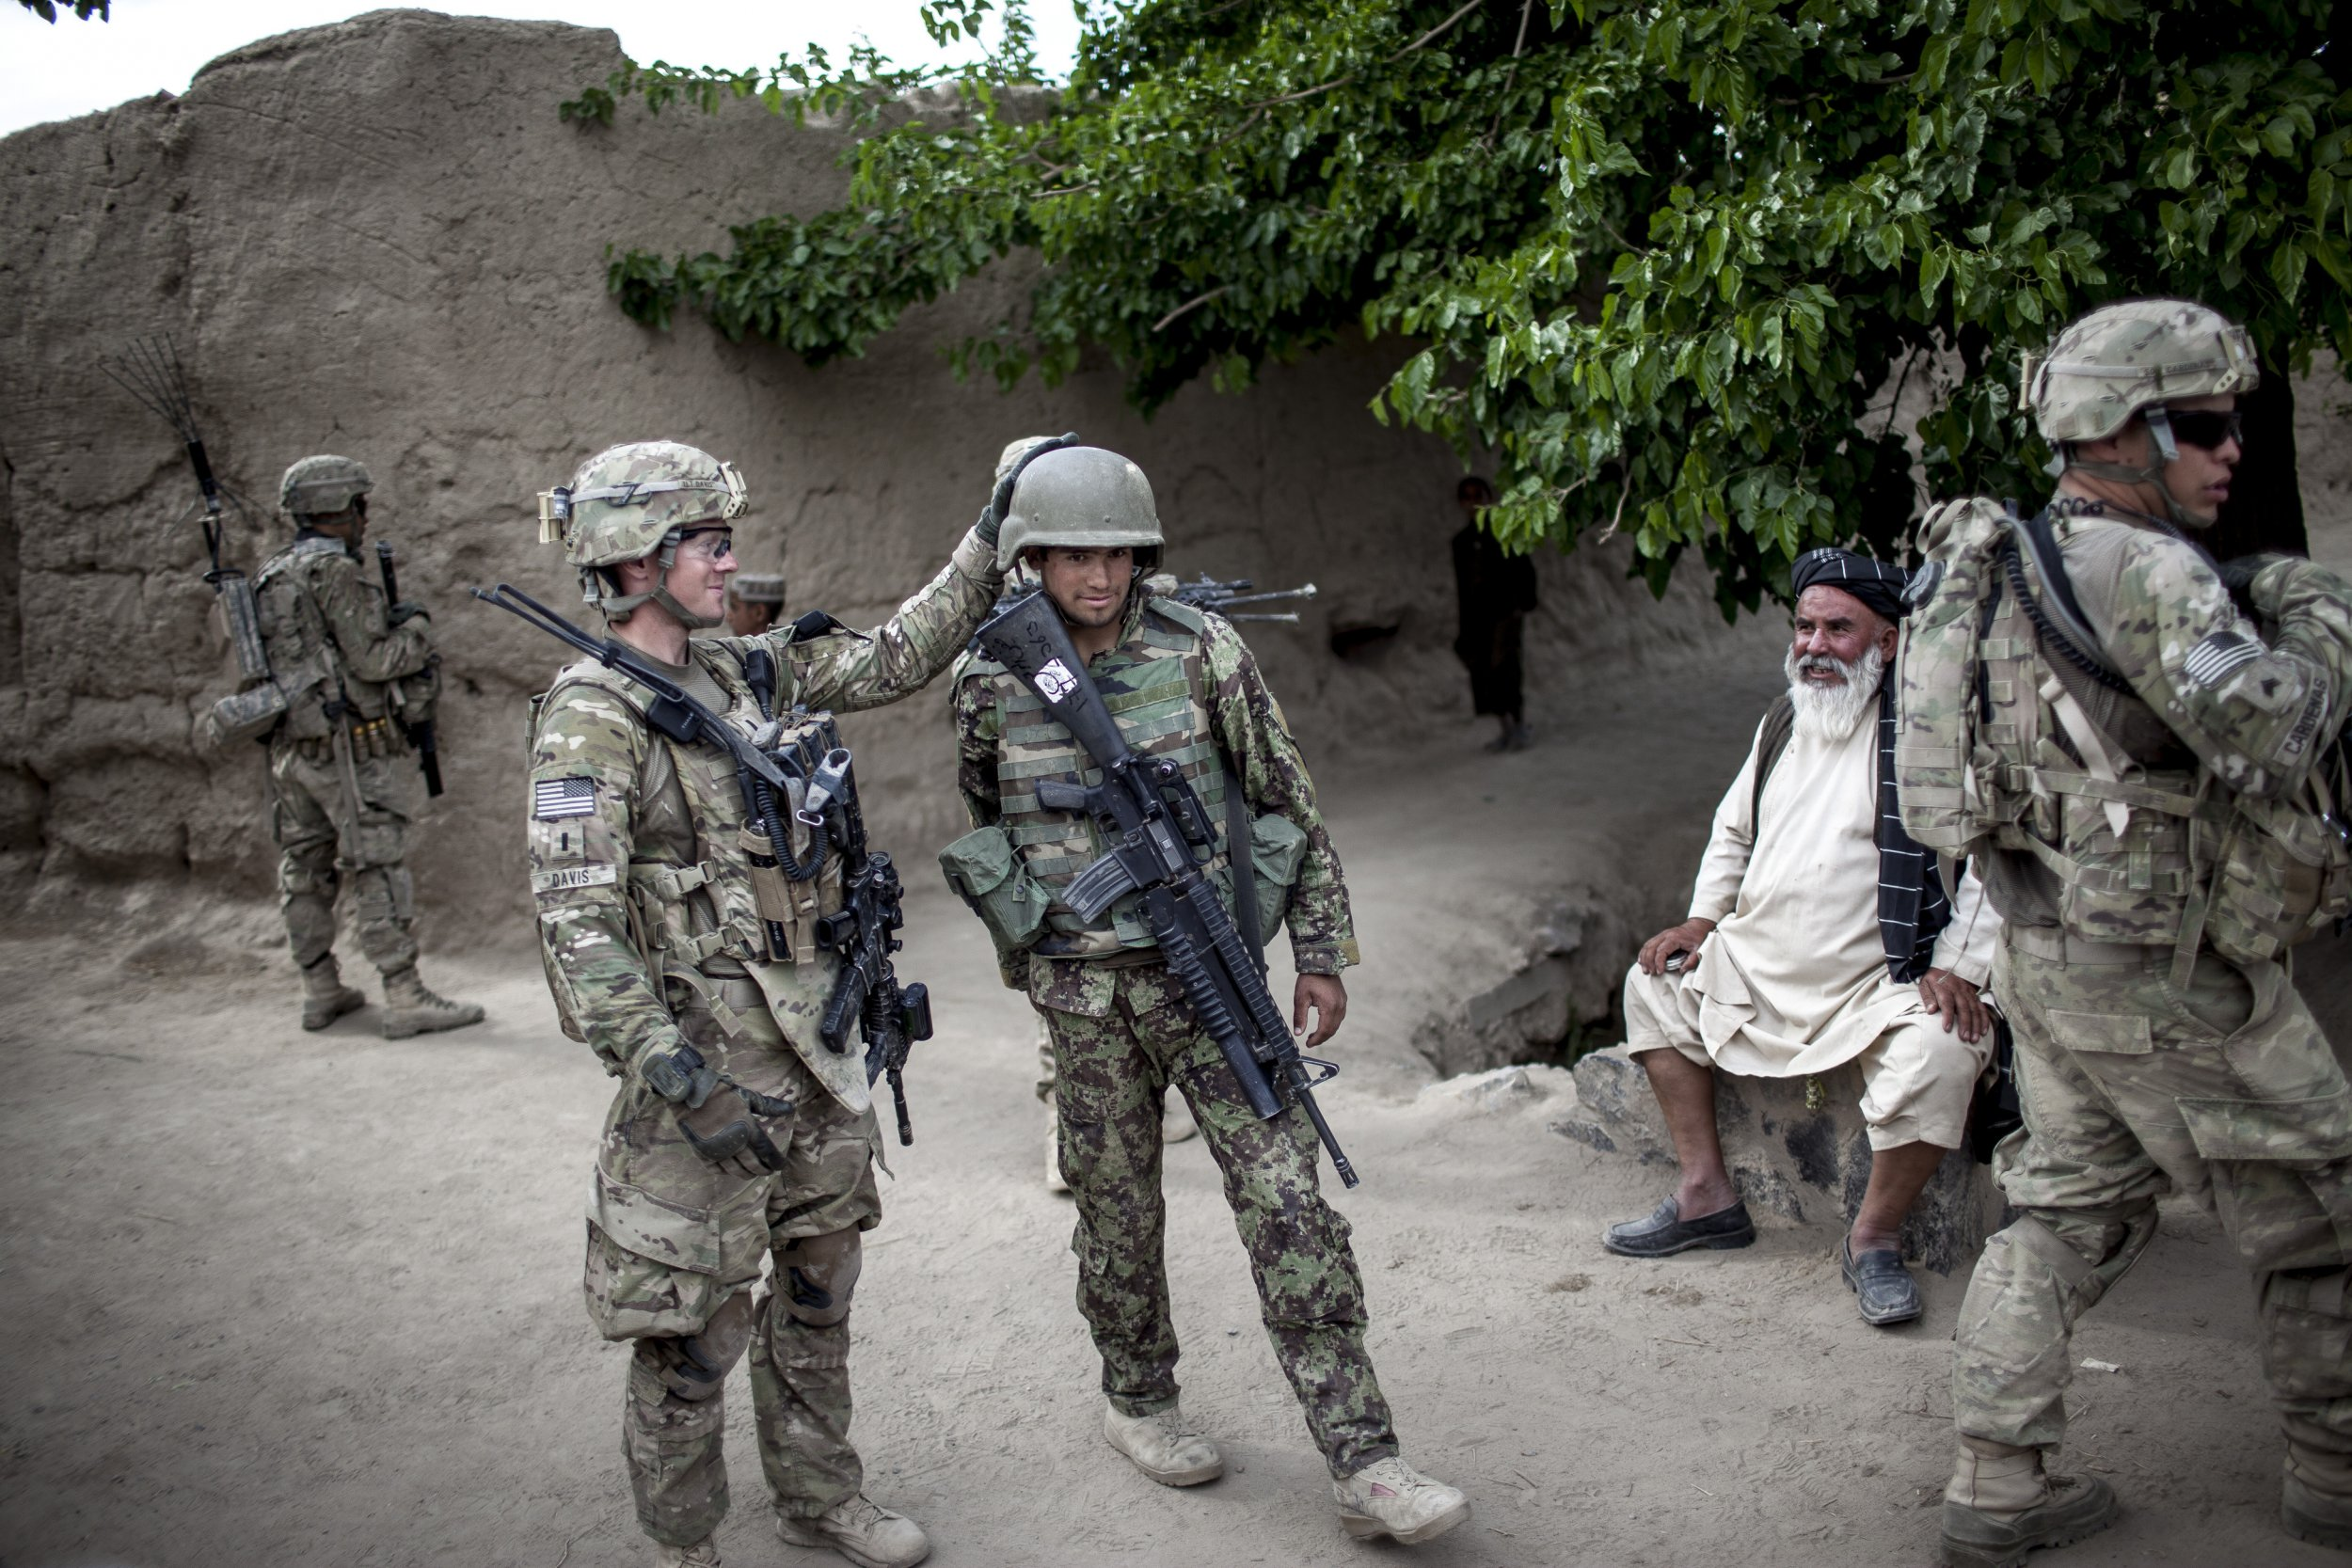 05_22_AfghanWeapons_02